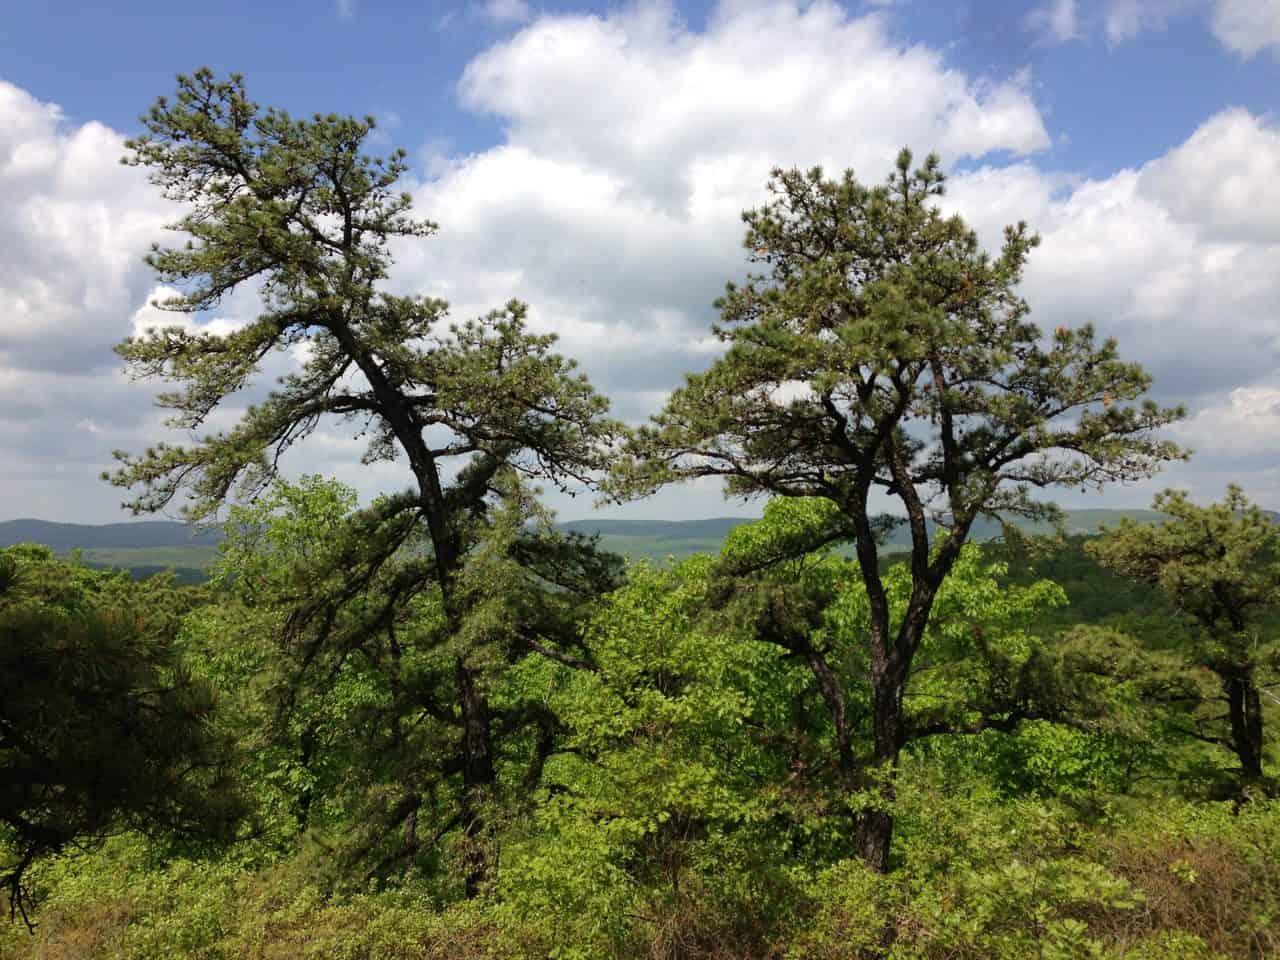 Pitch-Pine-Pinus-Rigida